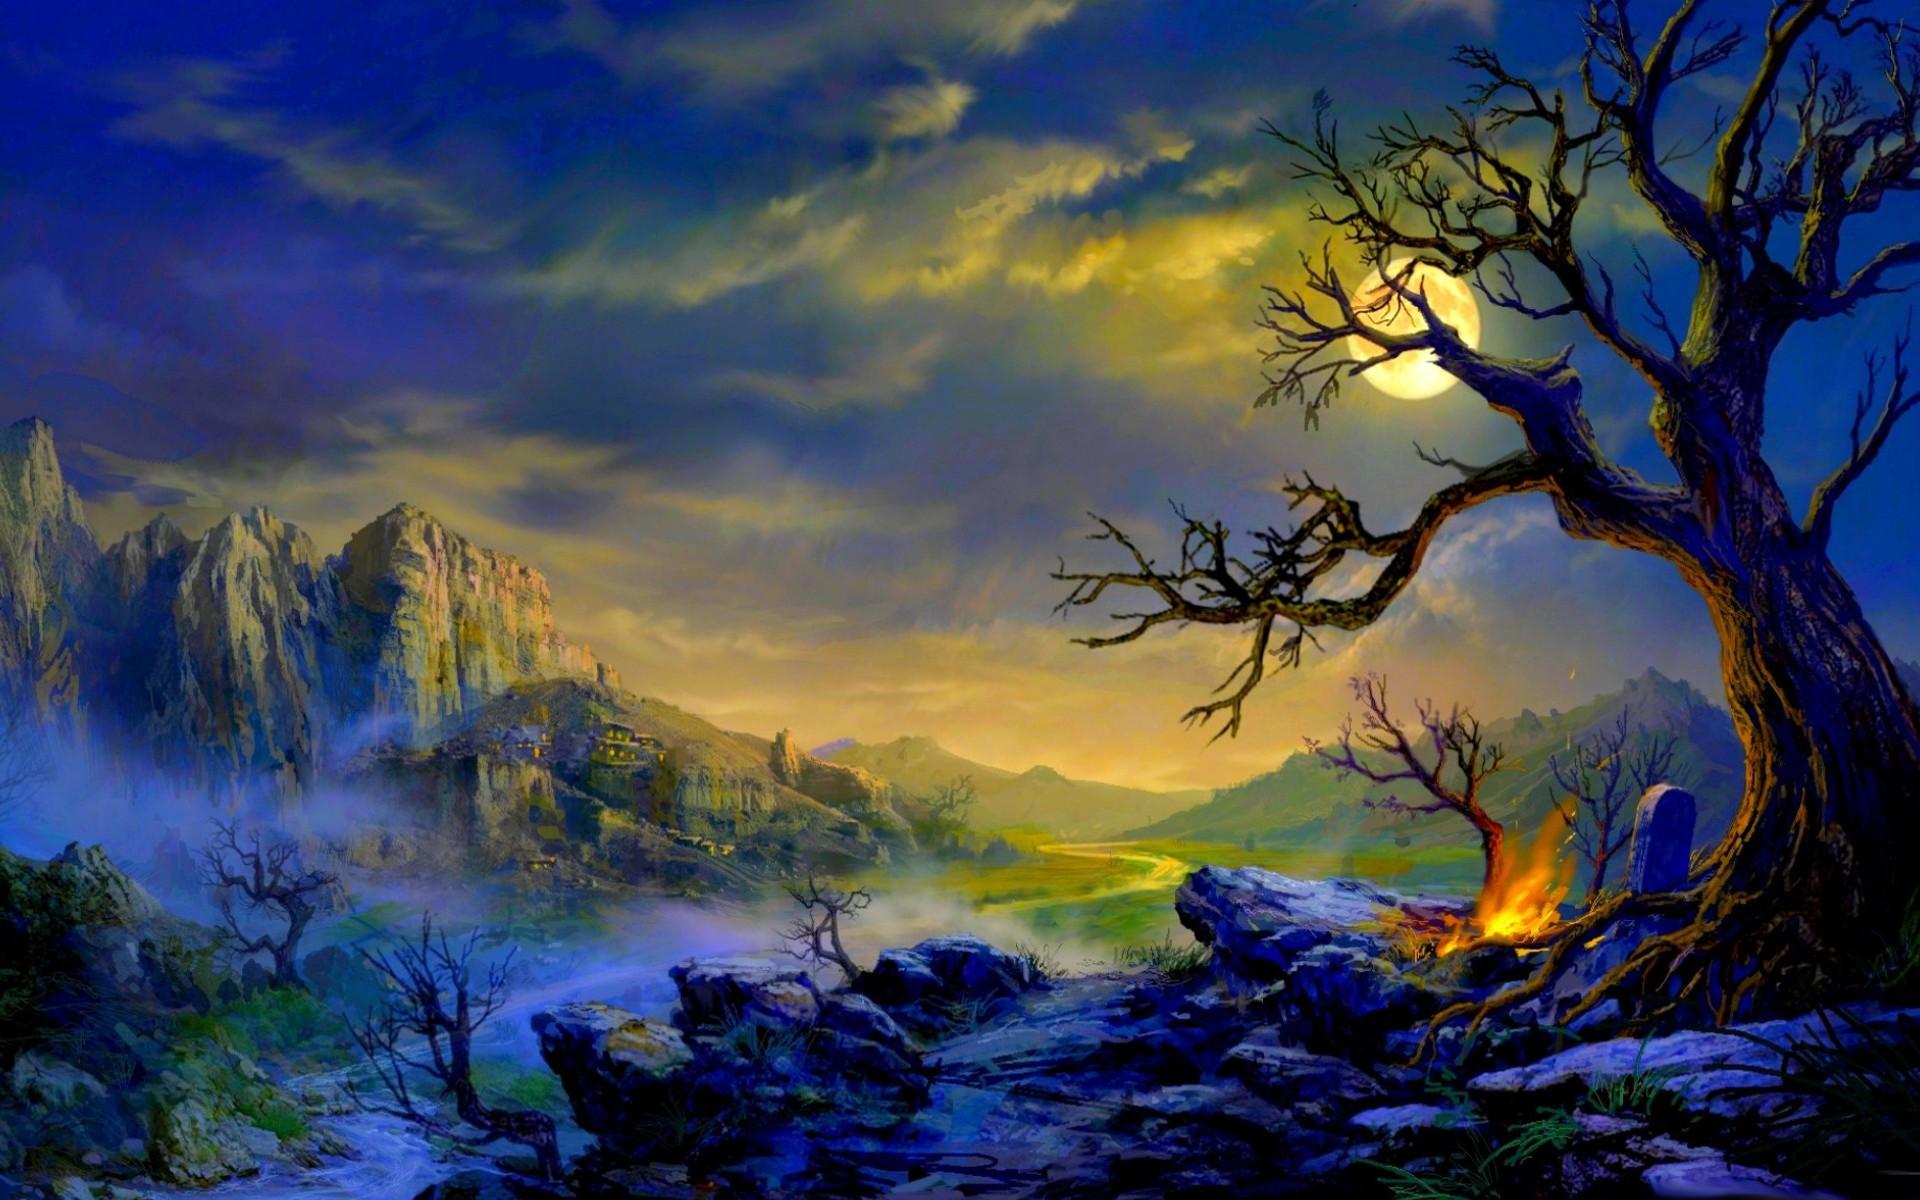 Paesaggi hd wallpaper sfondi 1920x1200 id 550181 for Paesaggi per sfondi